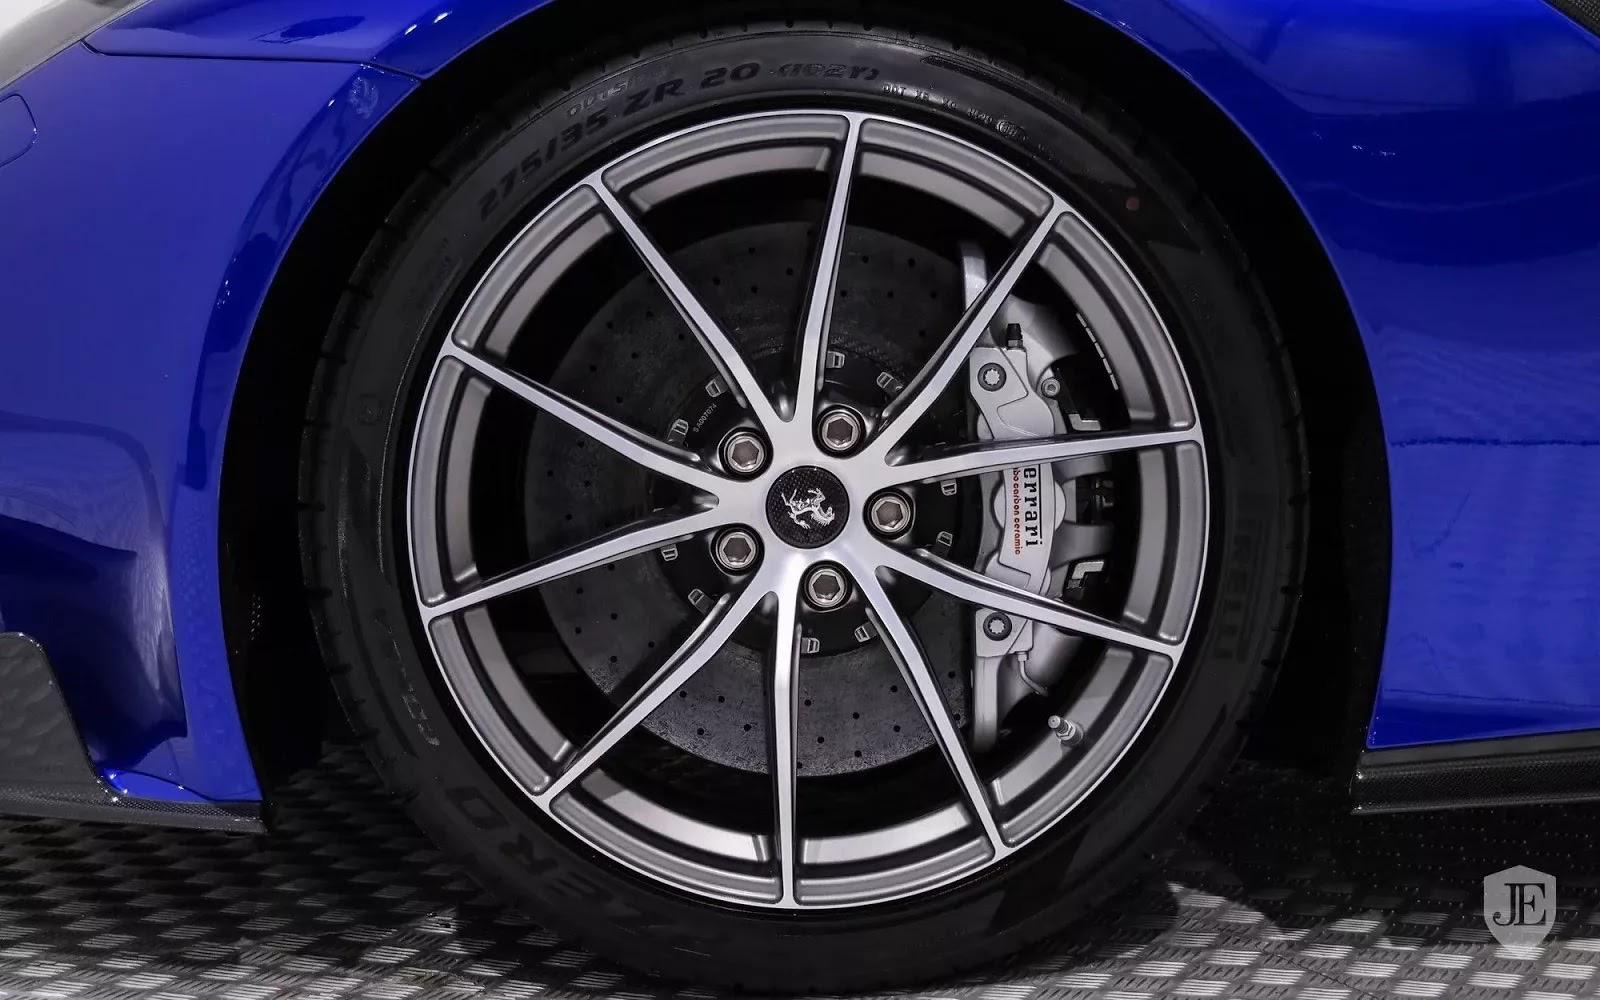 One-Off_Electric_Blue_Ferrari_F12tdf_06